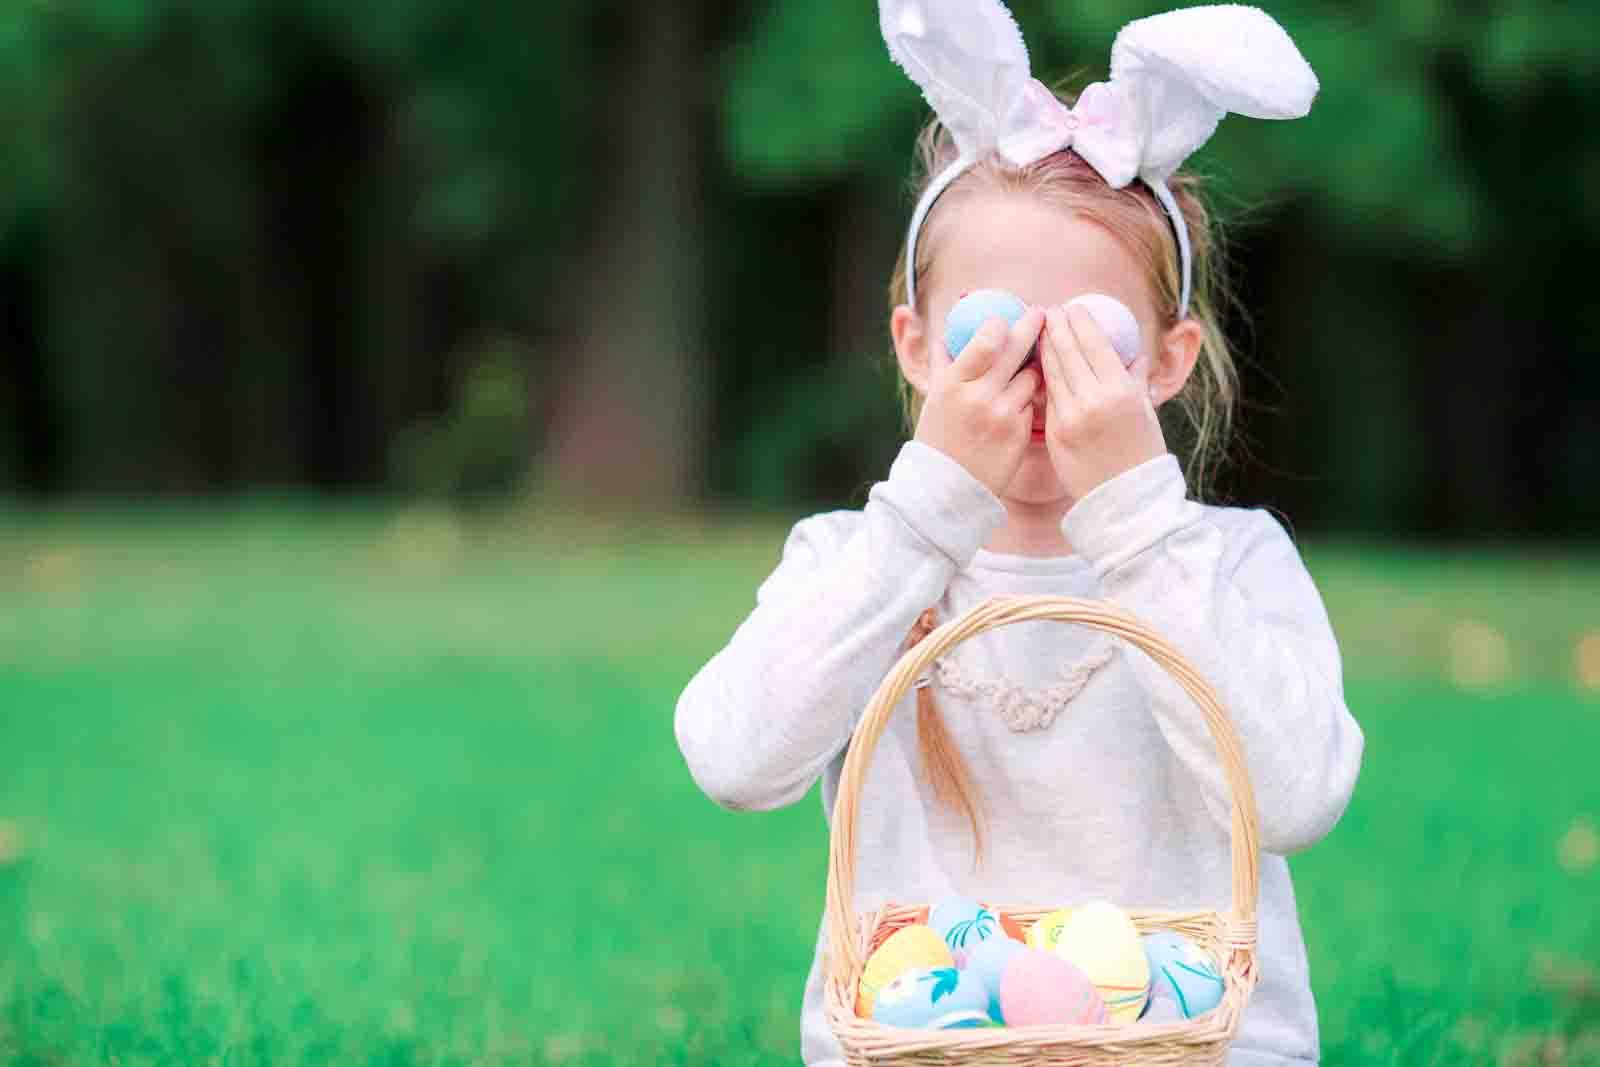 Easter Egg Hunt Ideas for Kids Fun Kids Activities for Easter Easter Games